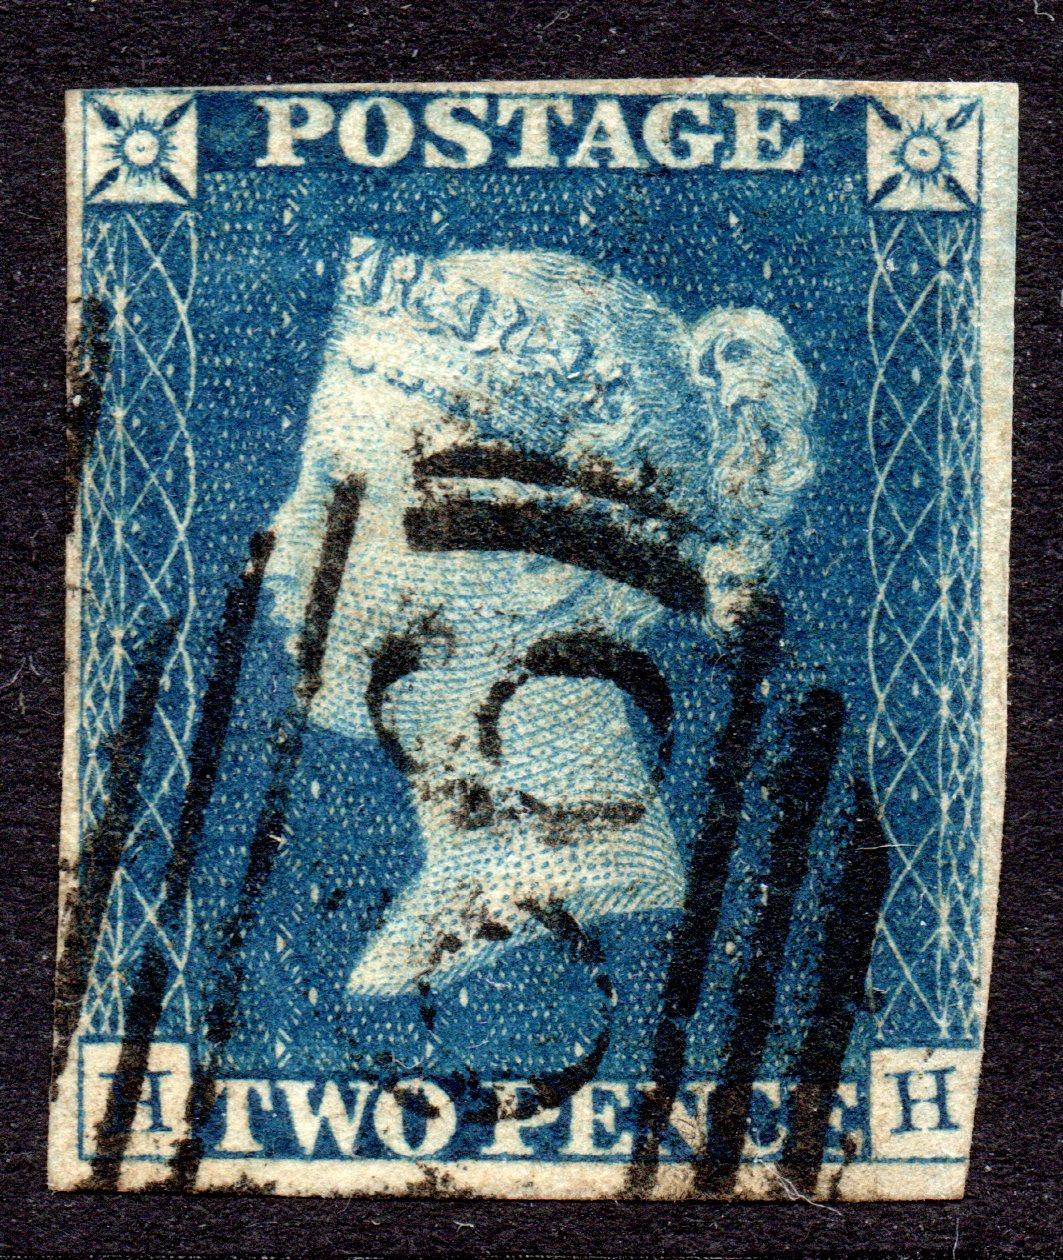 1840 2d Deep Blue Plate 1 - SCARCE 1844 NUMERAL - SG Cat £1700+